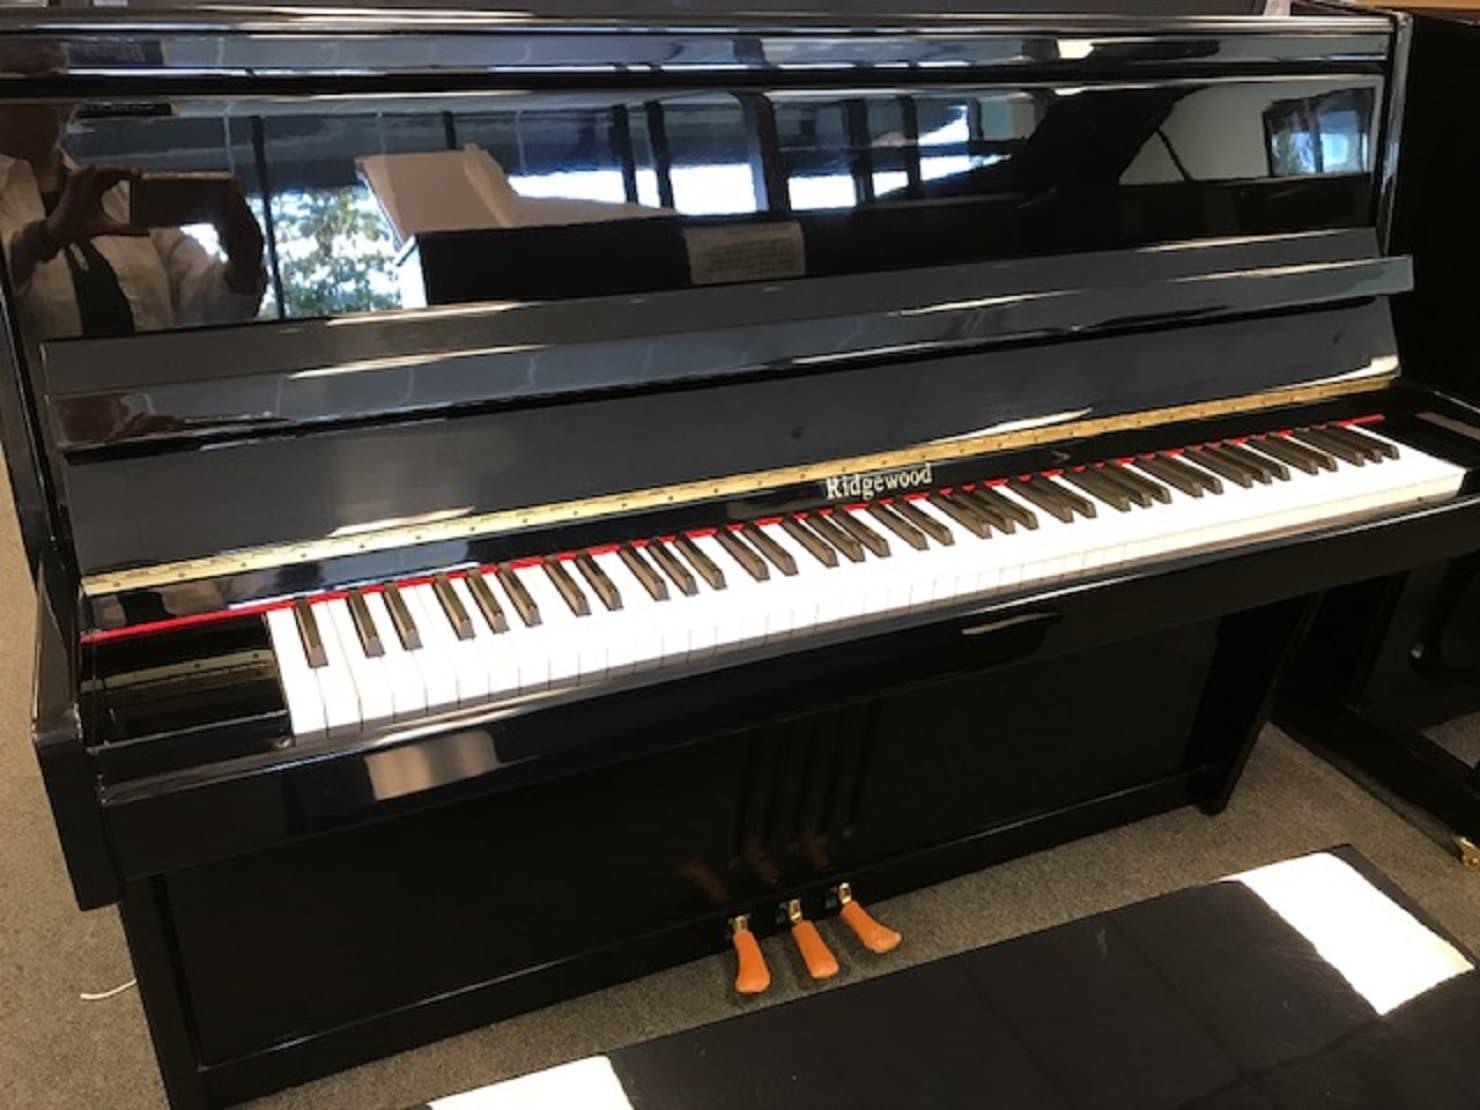 Ridgewood Console Piano